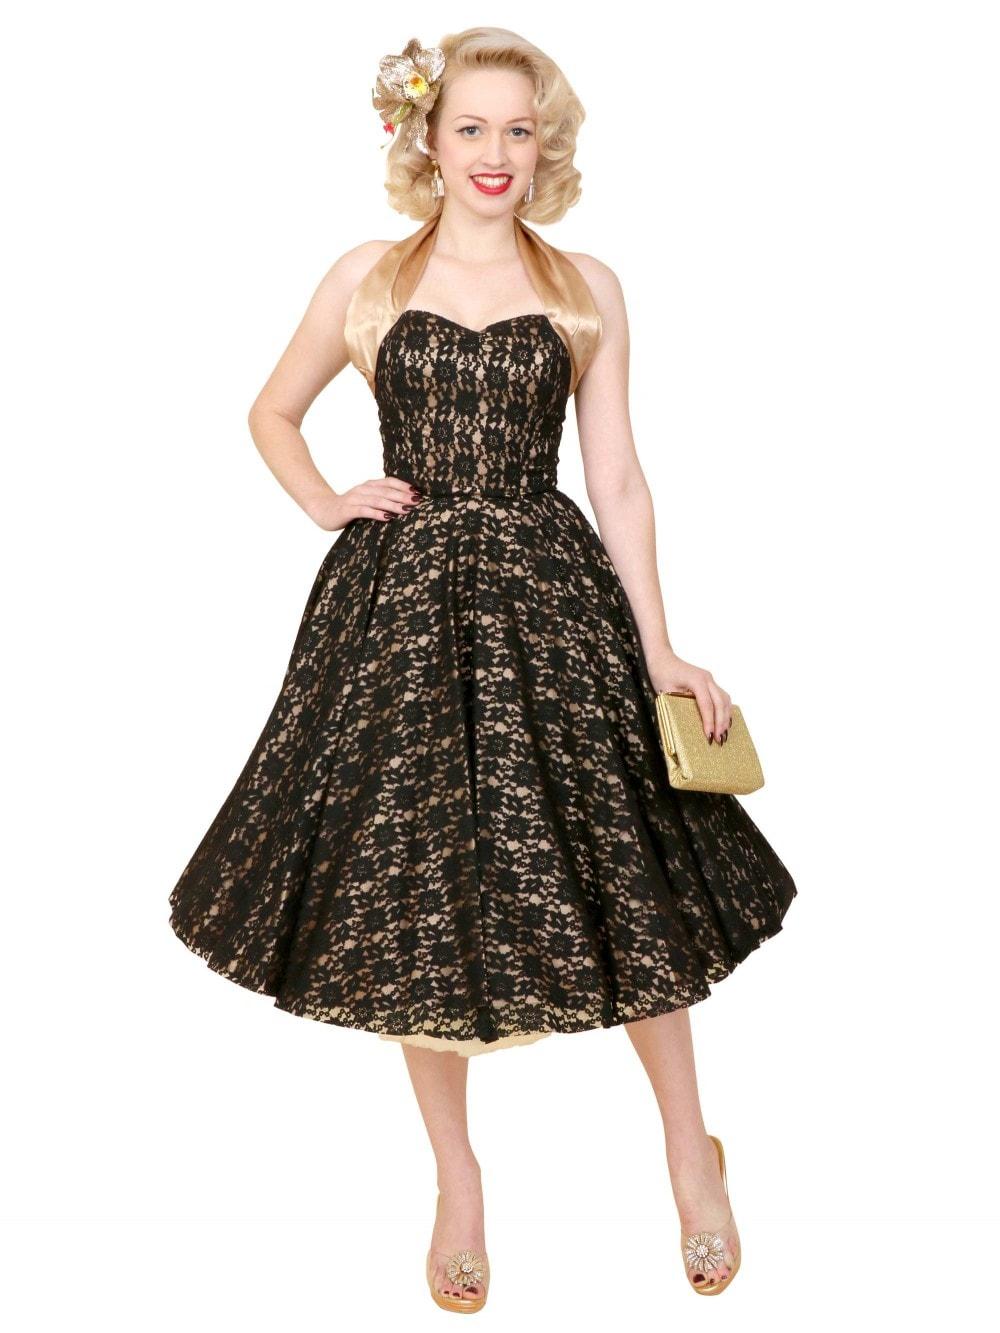 ad8284eaf39 1950s Halterneck Luxury Champagne New Black Lace Dress from Vivien ...